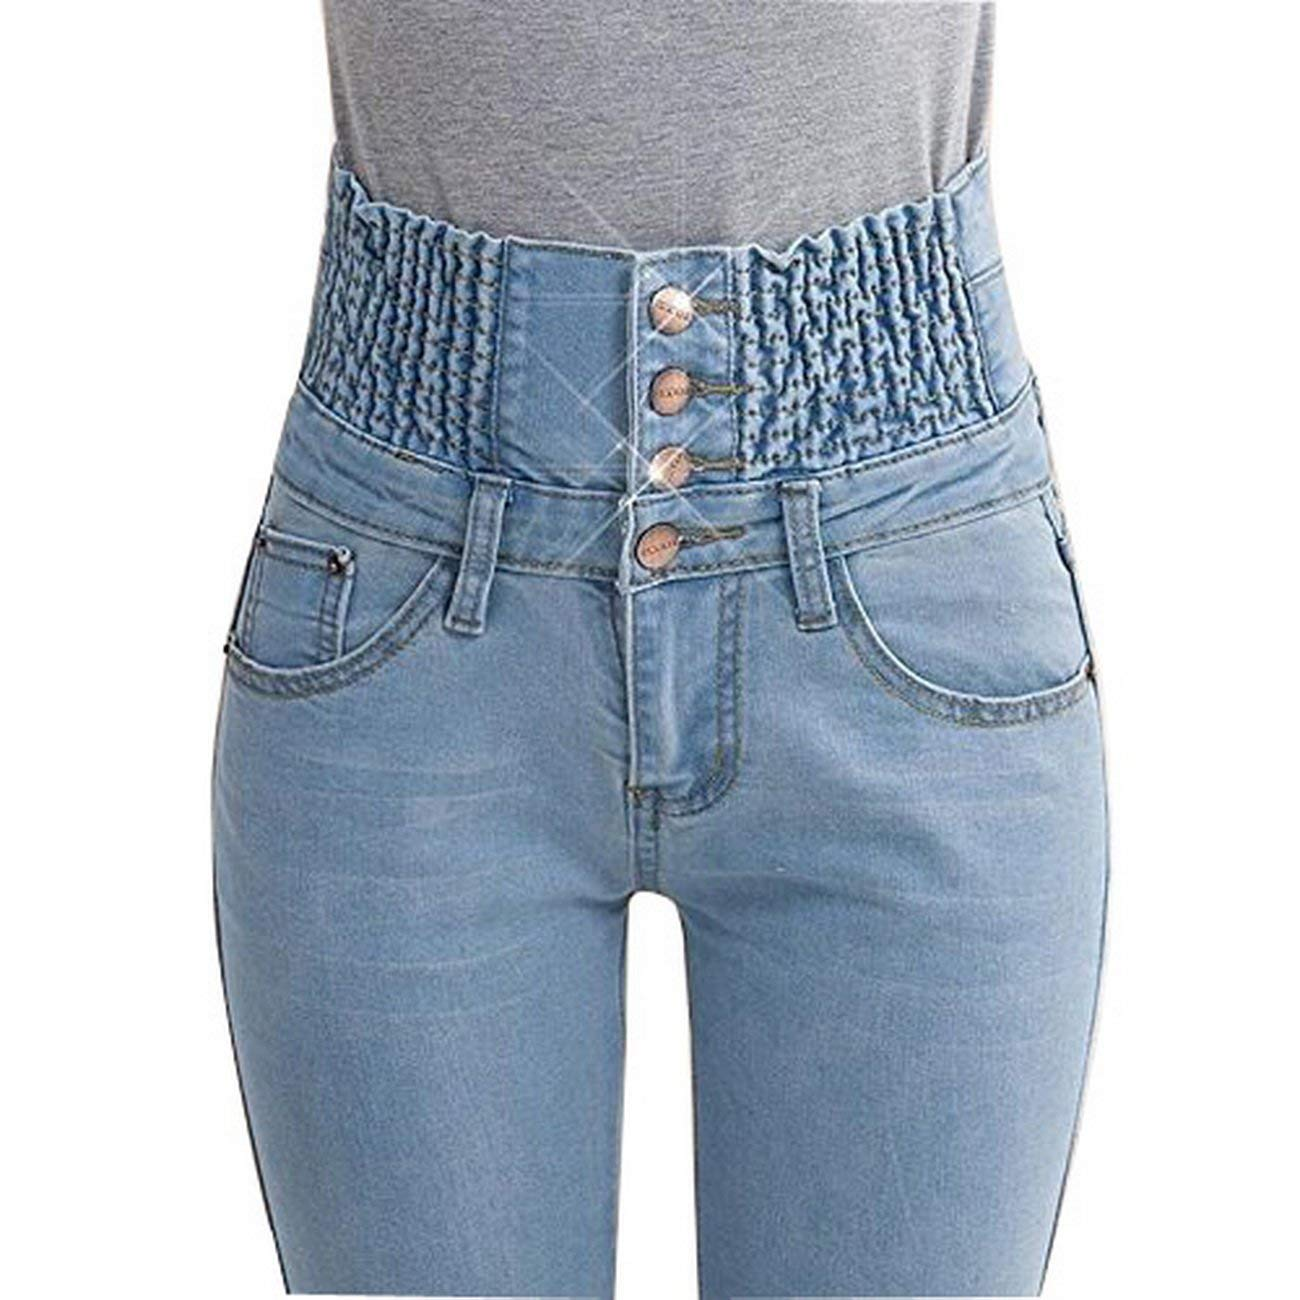 ad76378cfc629 Get Quotations · Women s High Waist Elastic Skinny Denim Long Pencil Pants  Plus Size Woman Jeans Camisa Feminina Lady